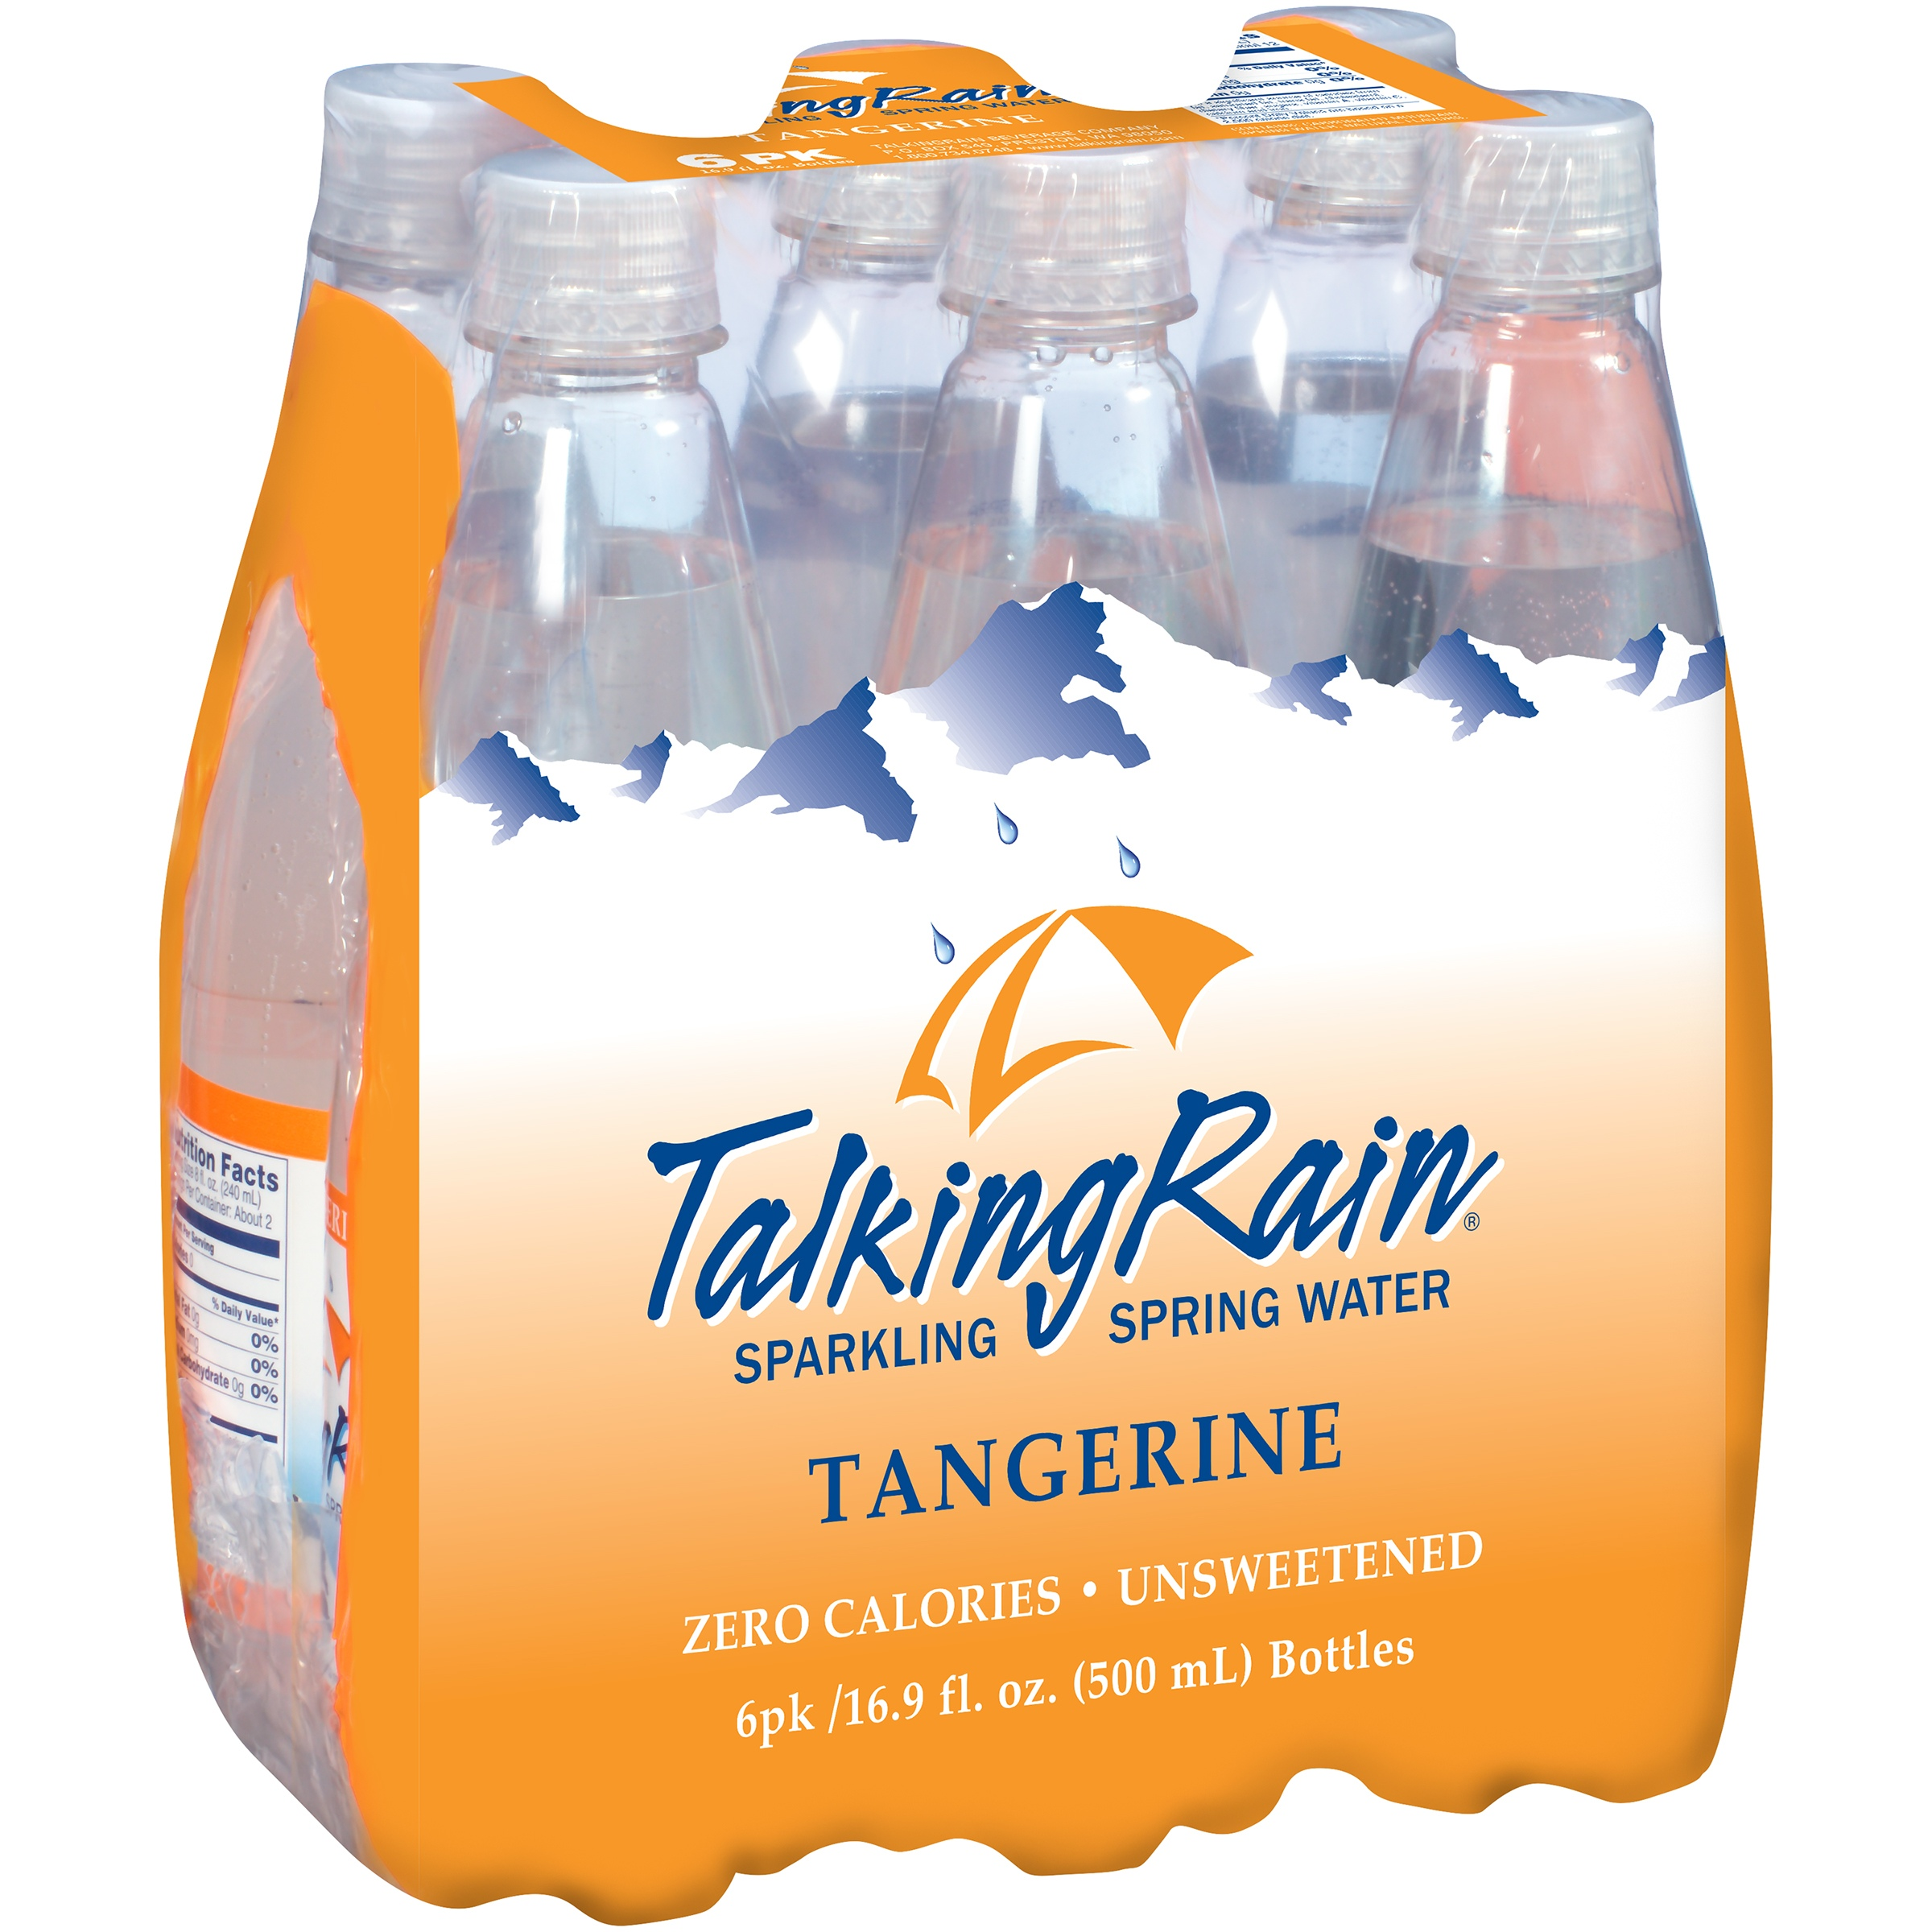 89d7efadf6 Talking Rain® Tangerine Sparkling Water, 16.9 Fl Oz Bottle (Pack of 6)  - Walmart.com